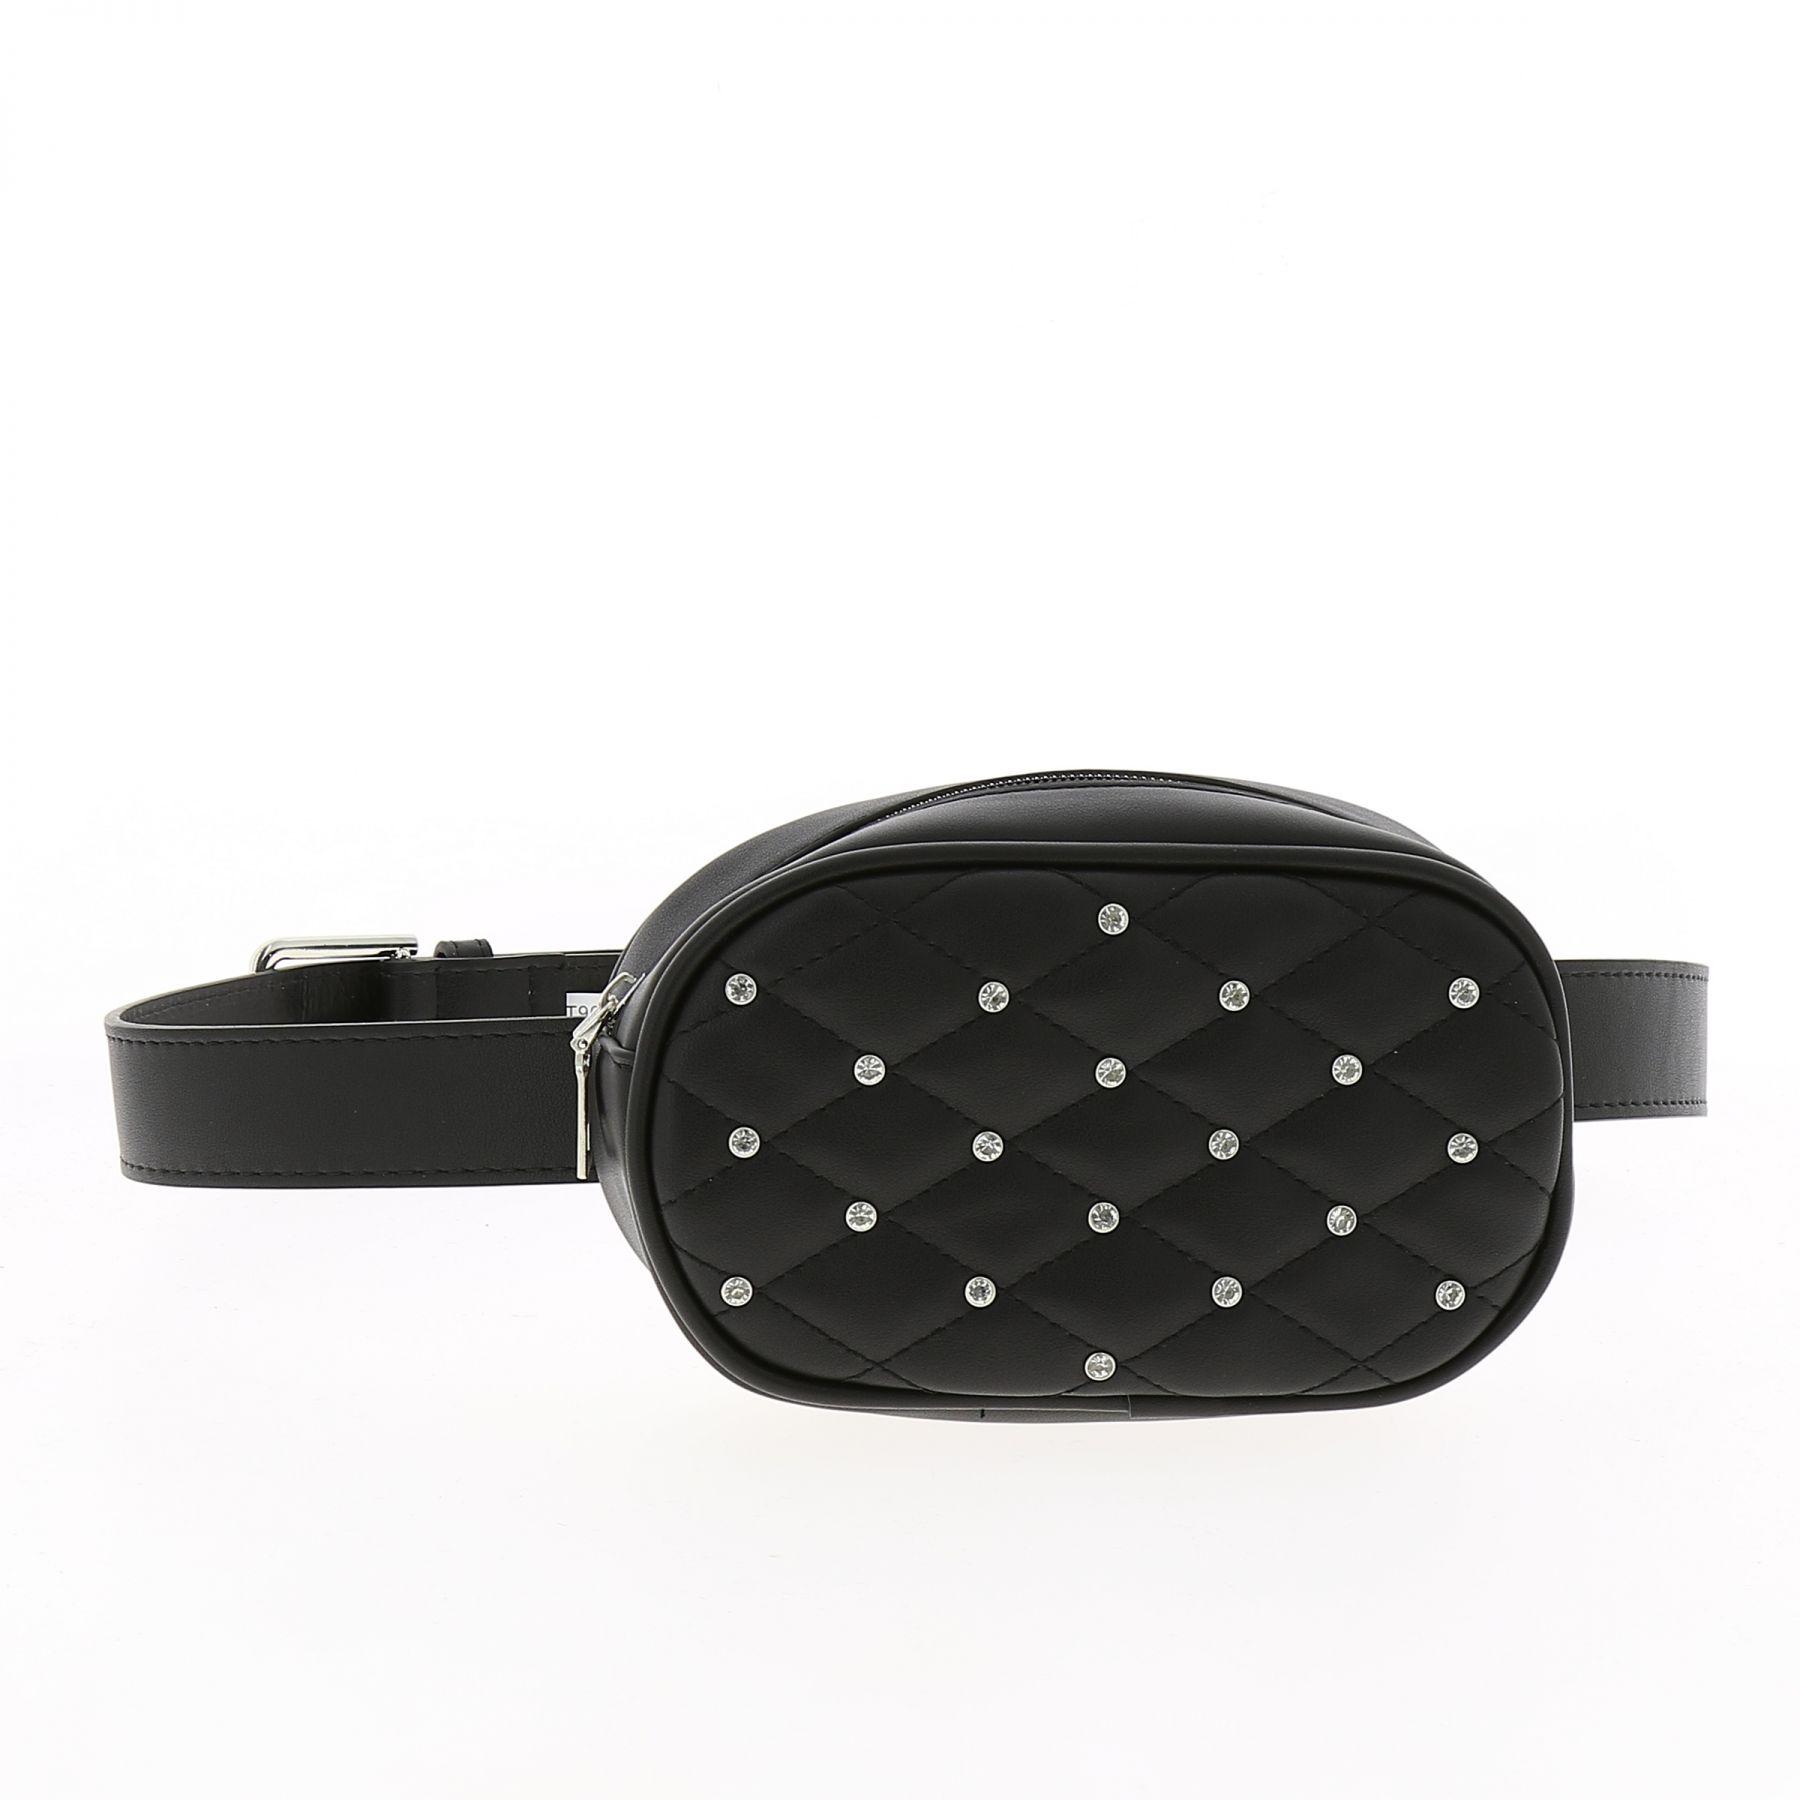 e01d8a83815f Bolsa con Cinturón para mujer, KELLY - Le-grossiste.fr